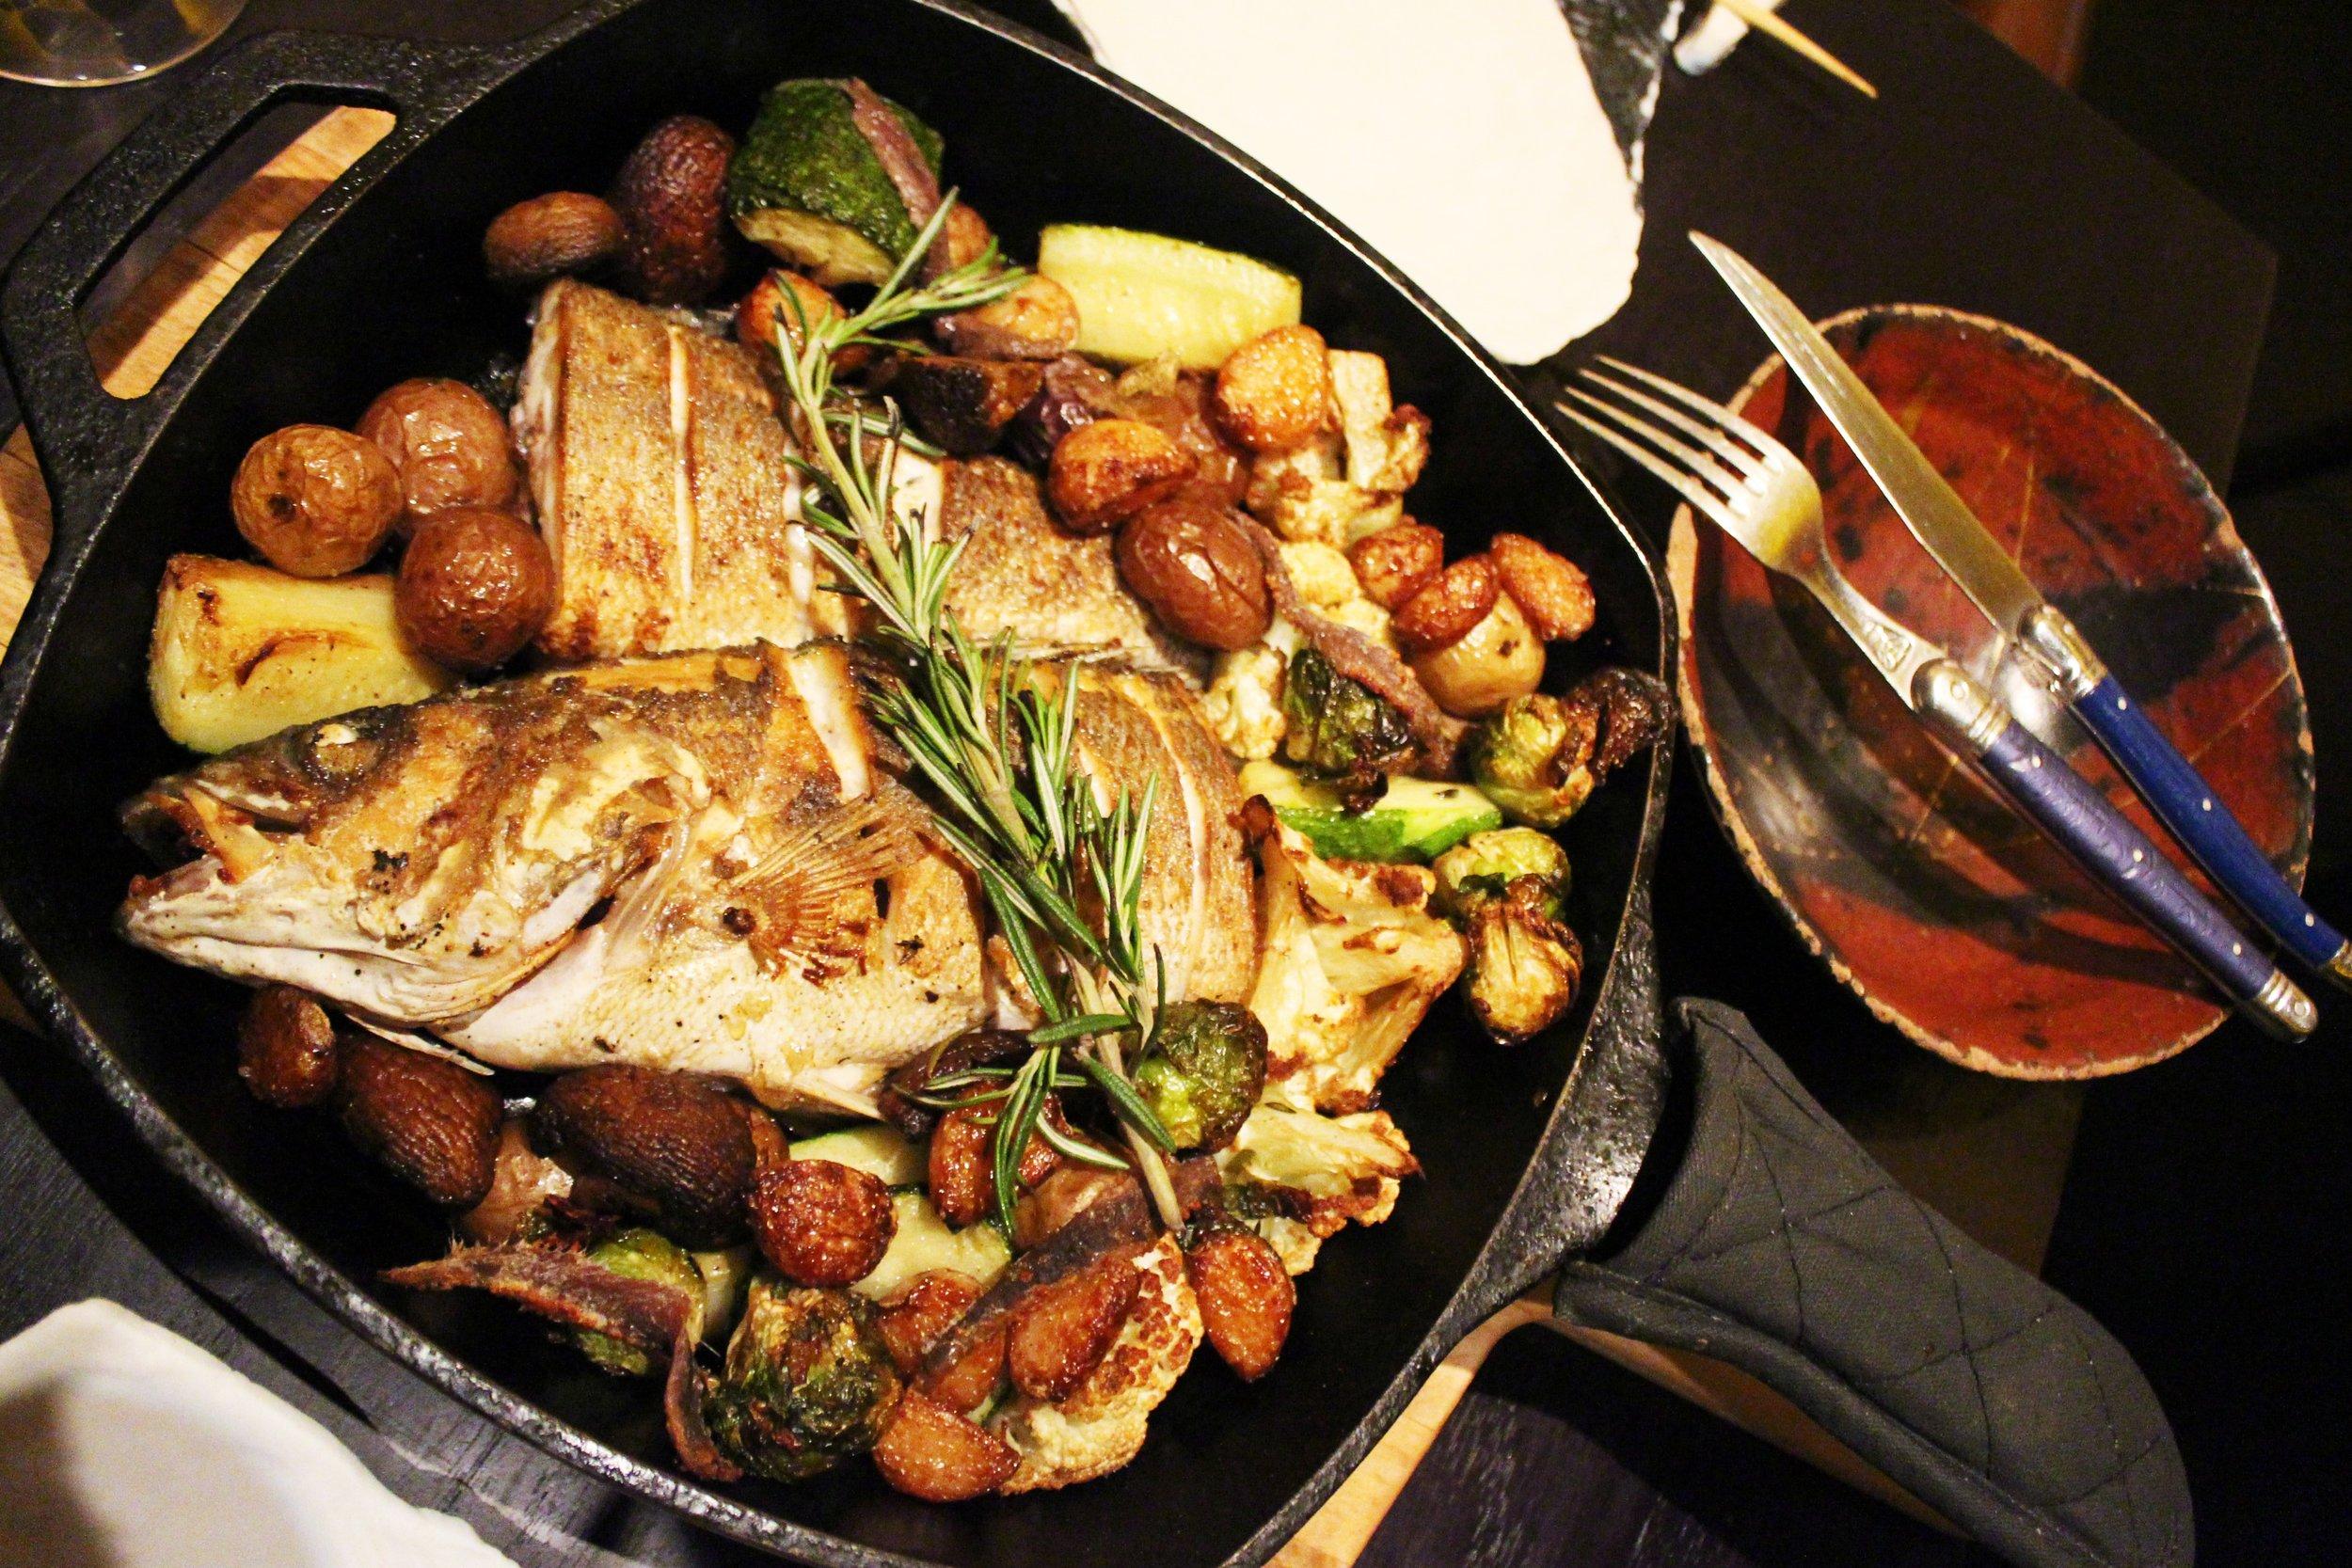 Pan Roasted Branzino with farmer's seasonal vegetables at Bohemian Restaurant